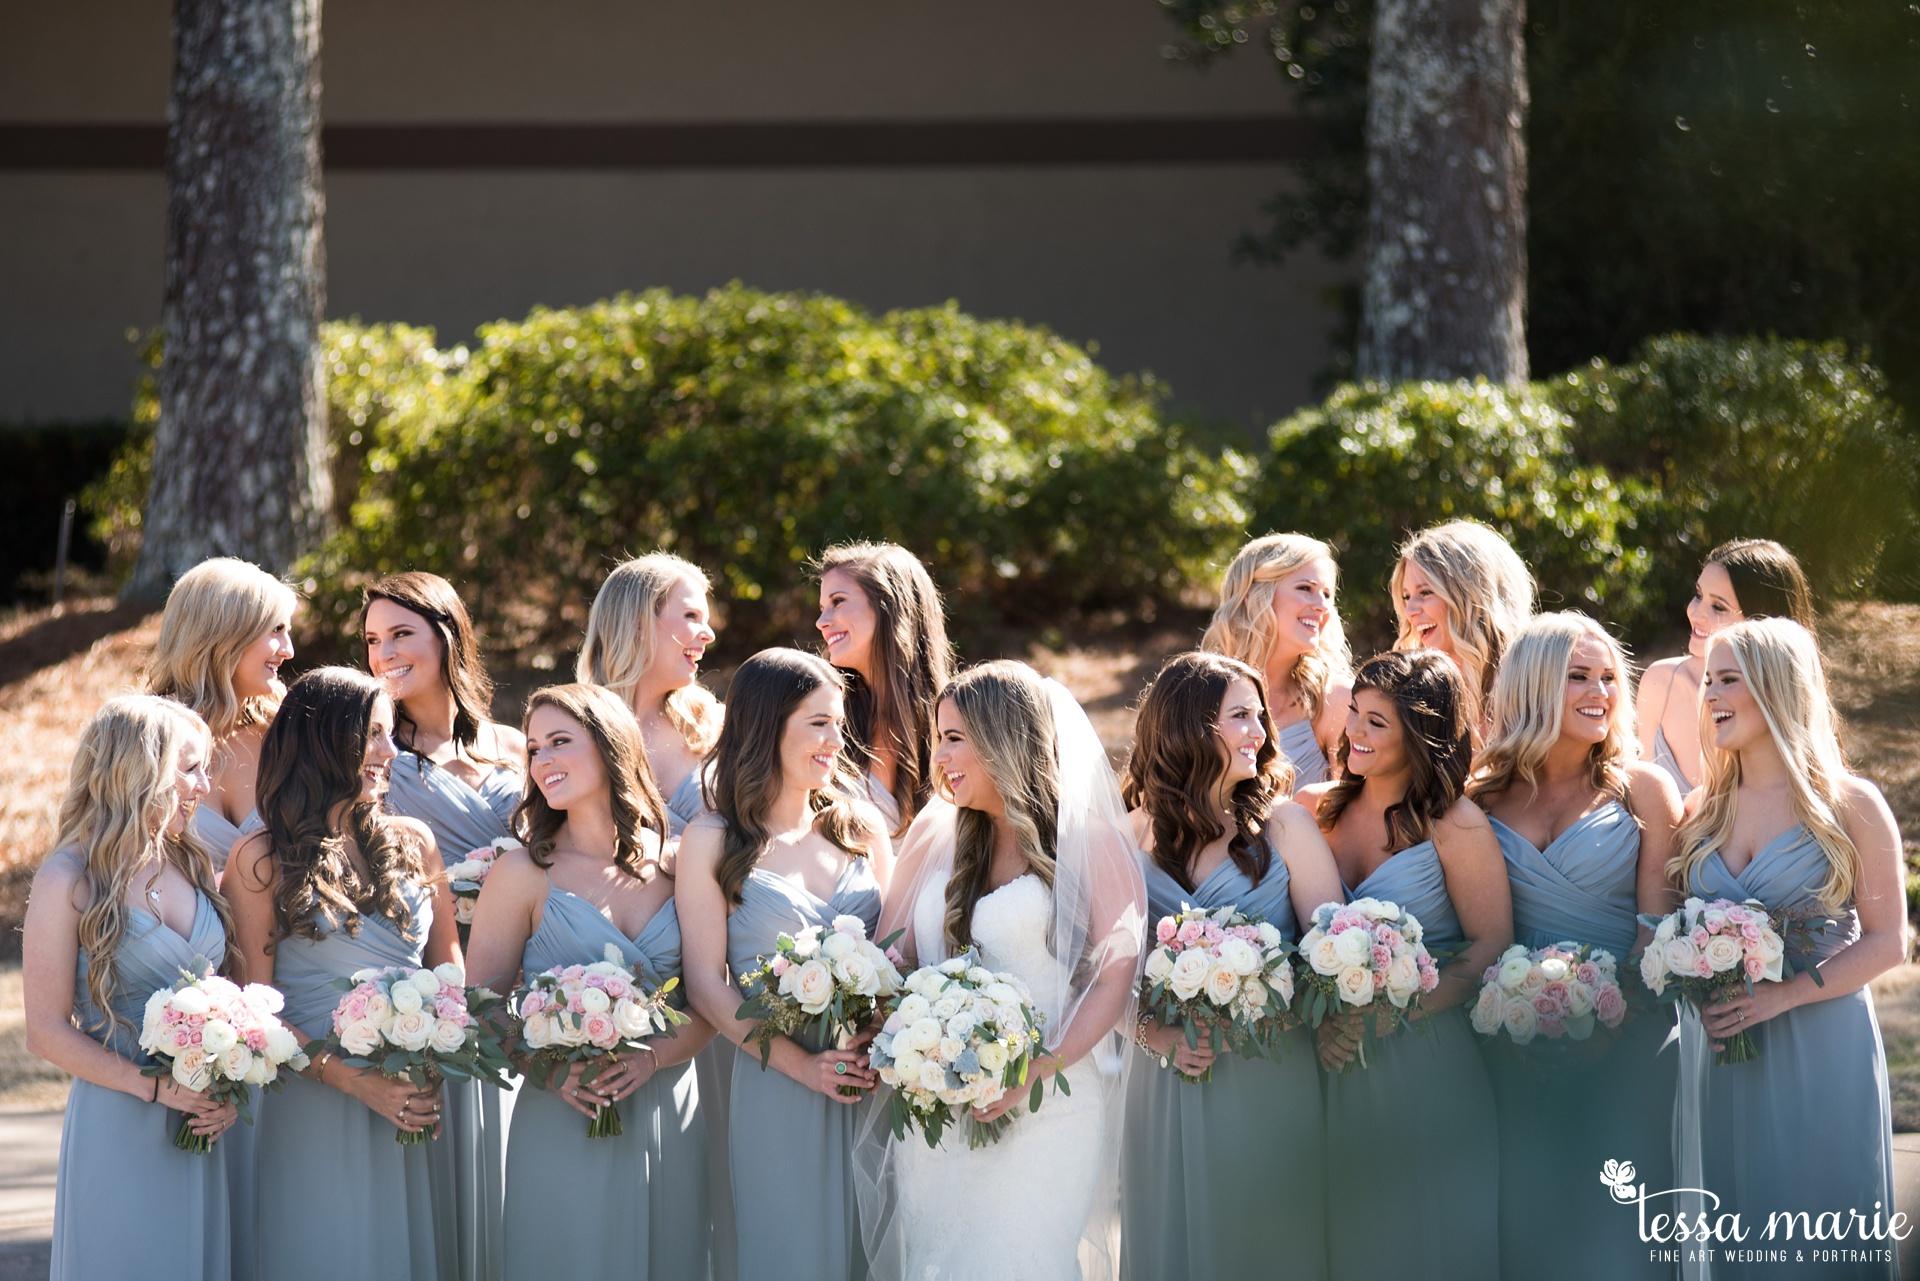 tessa_marie_legacy_moments_storytelling_candid_emotionally_driven_wedding_photographer_atlanta_wedding_photography_st_ives_country_club_wedding_boukates_bridals_by_lori_0018